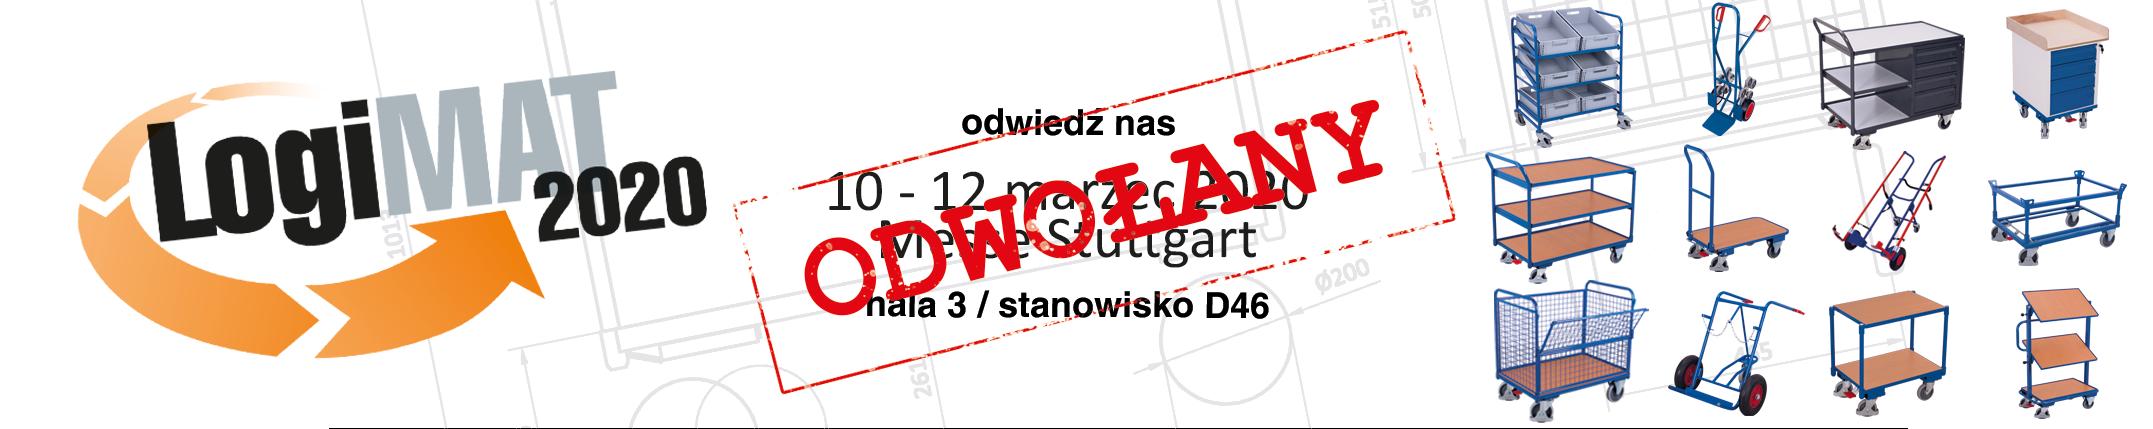 Logimat-2020-Homepage-Banner-po